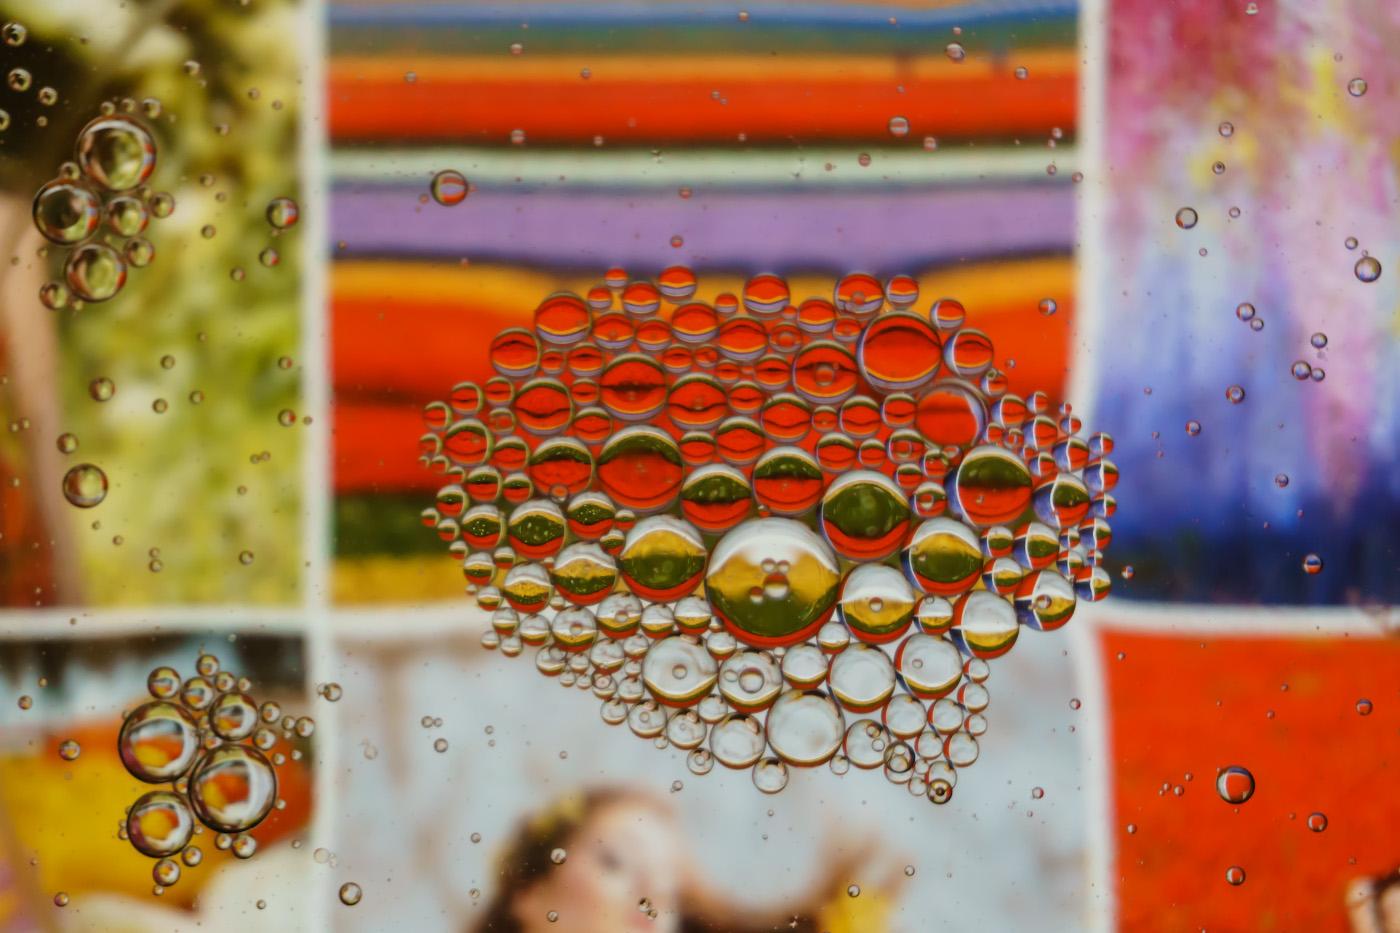 Фотография 2. Пример съемки абстрактного натюрморта с водой и маслом на беззеркалку Sony A6000 KIT 16-50mm f/3.5-5.6. Настройки: В=1/80 сек., f/5.6, ISO 800, ФР=50мм.